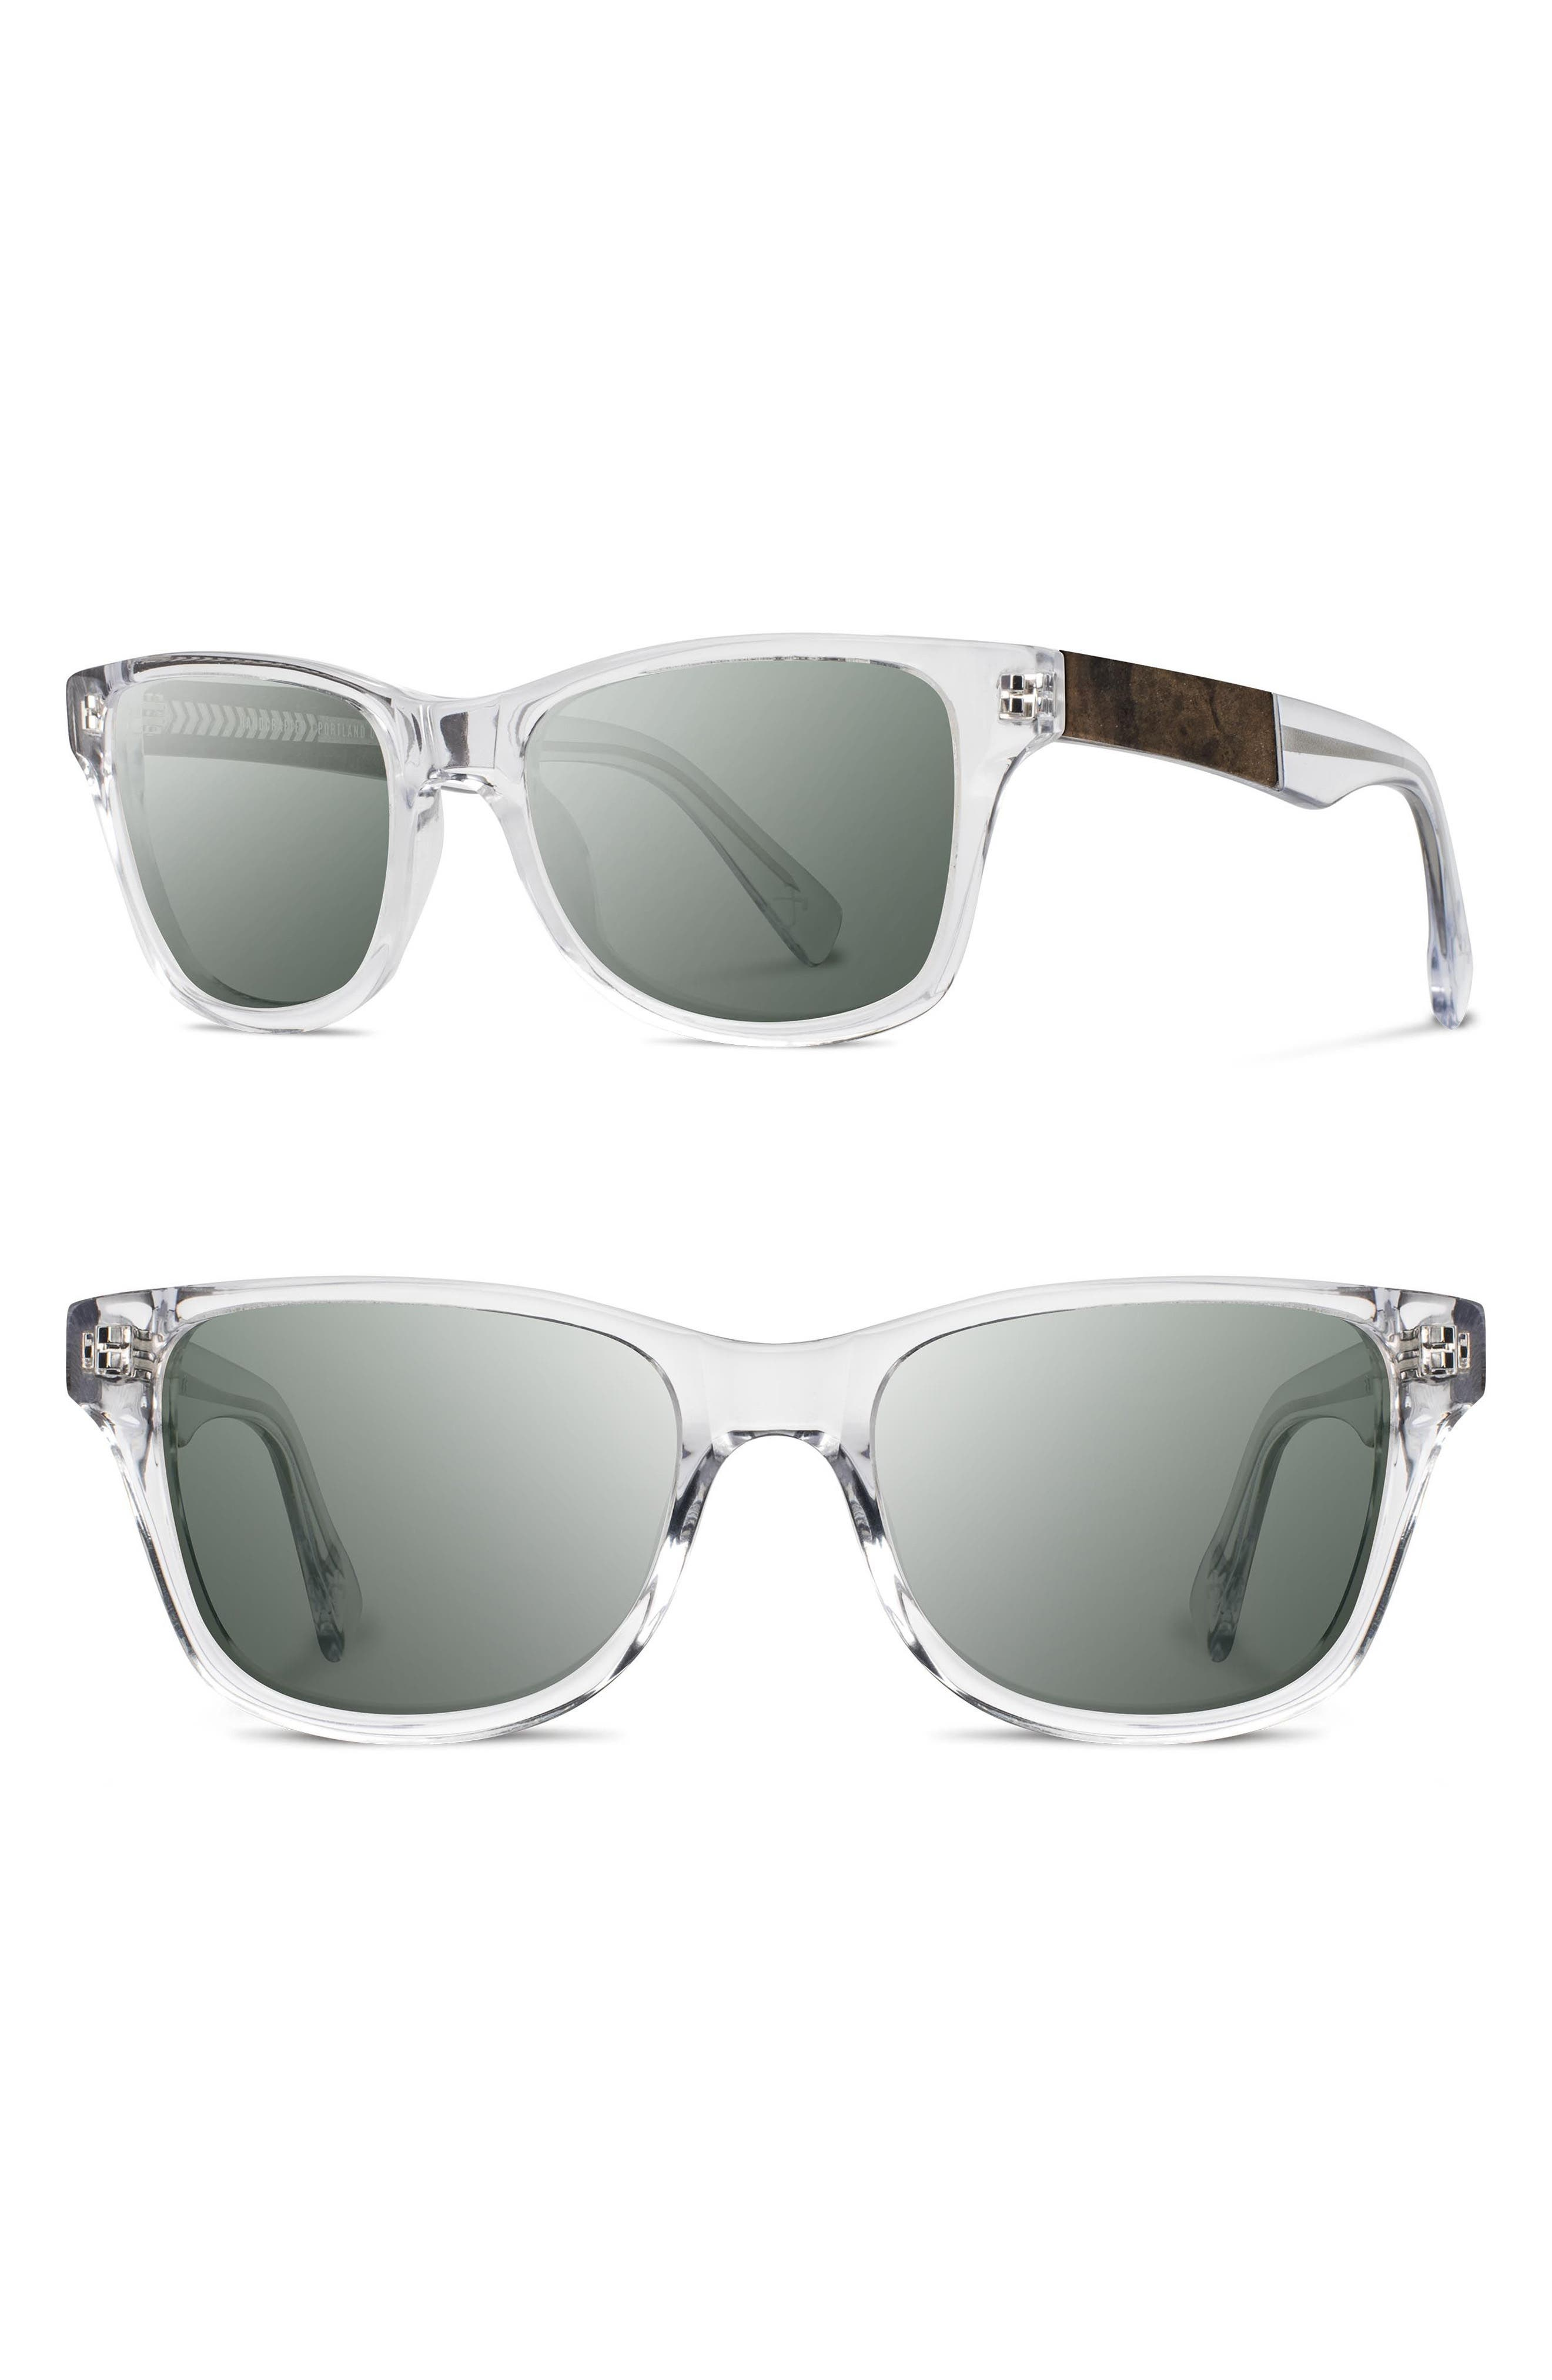 SHWOOD 'Canby' 54mm Acetate & Wood Sunglasses